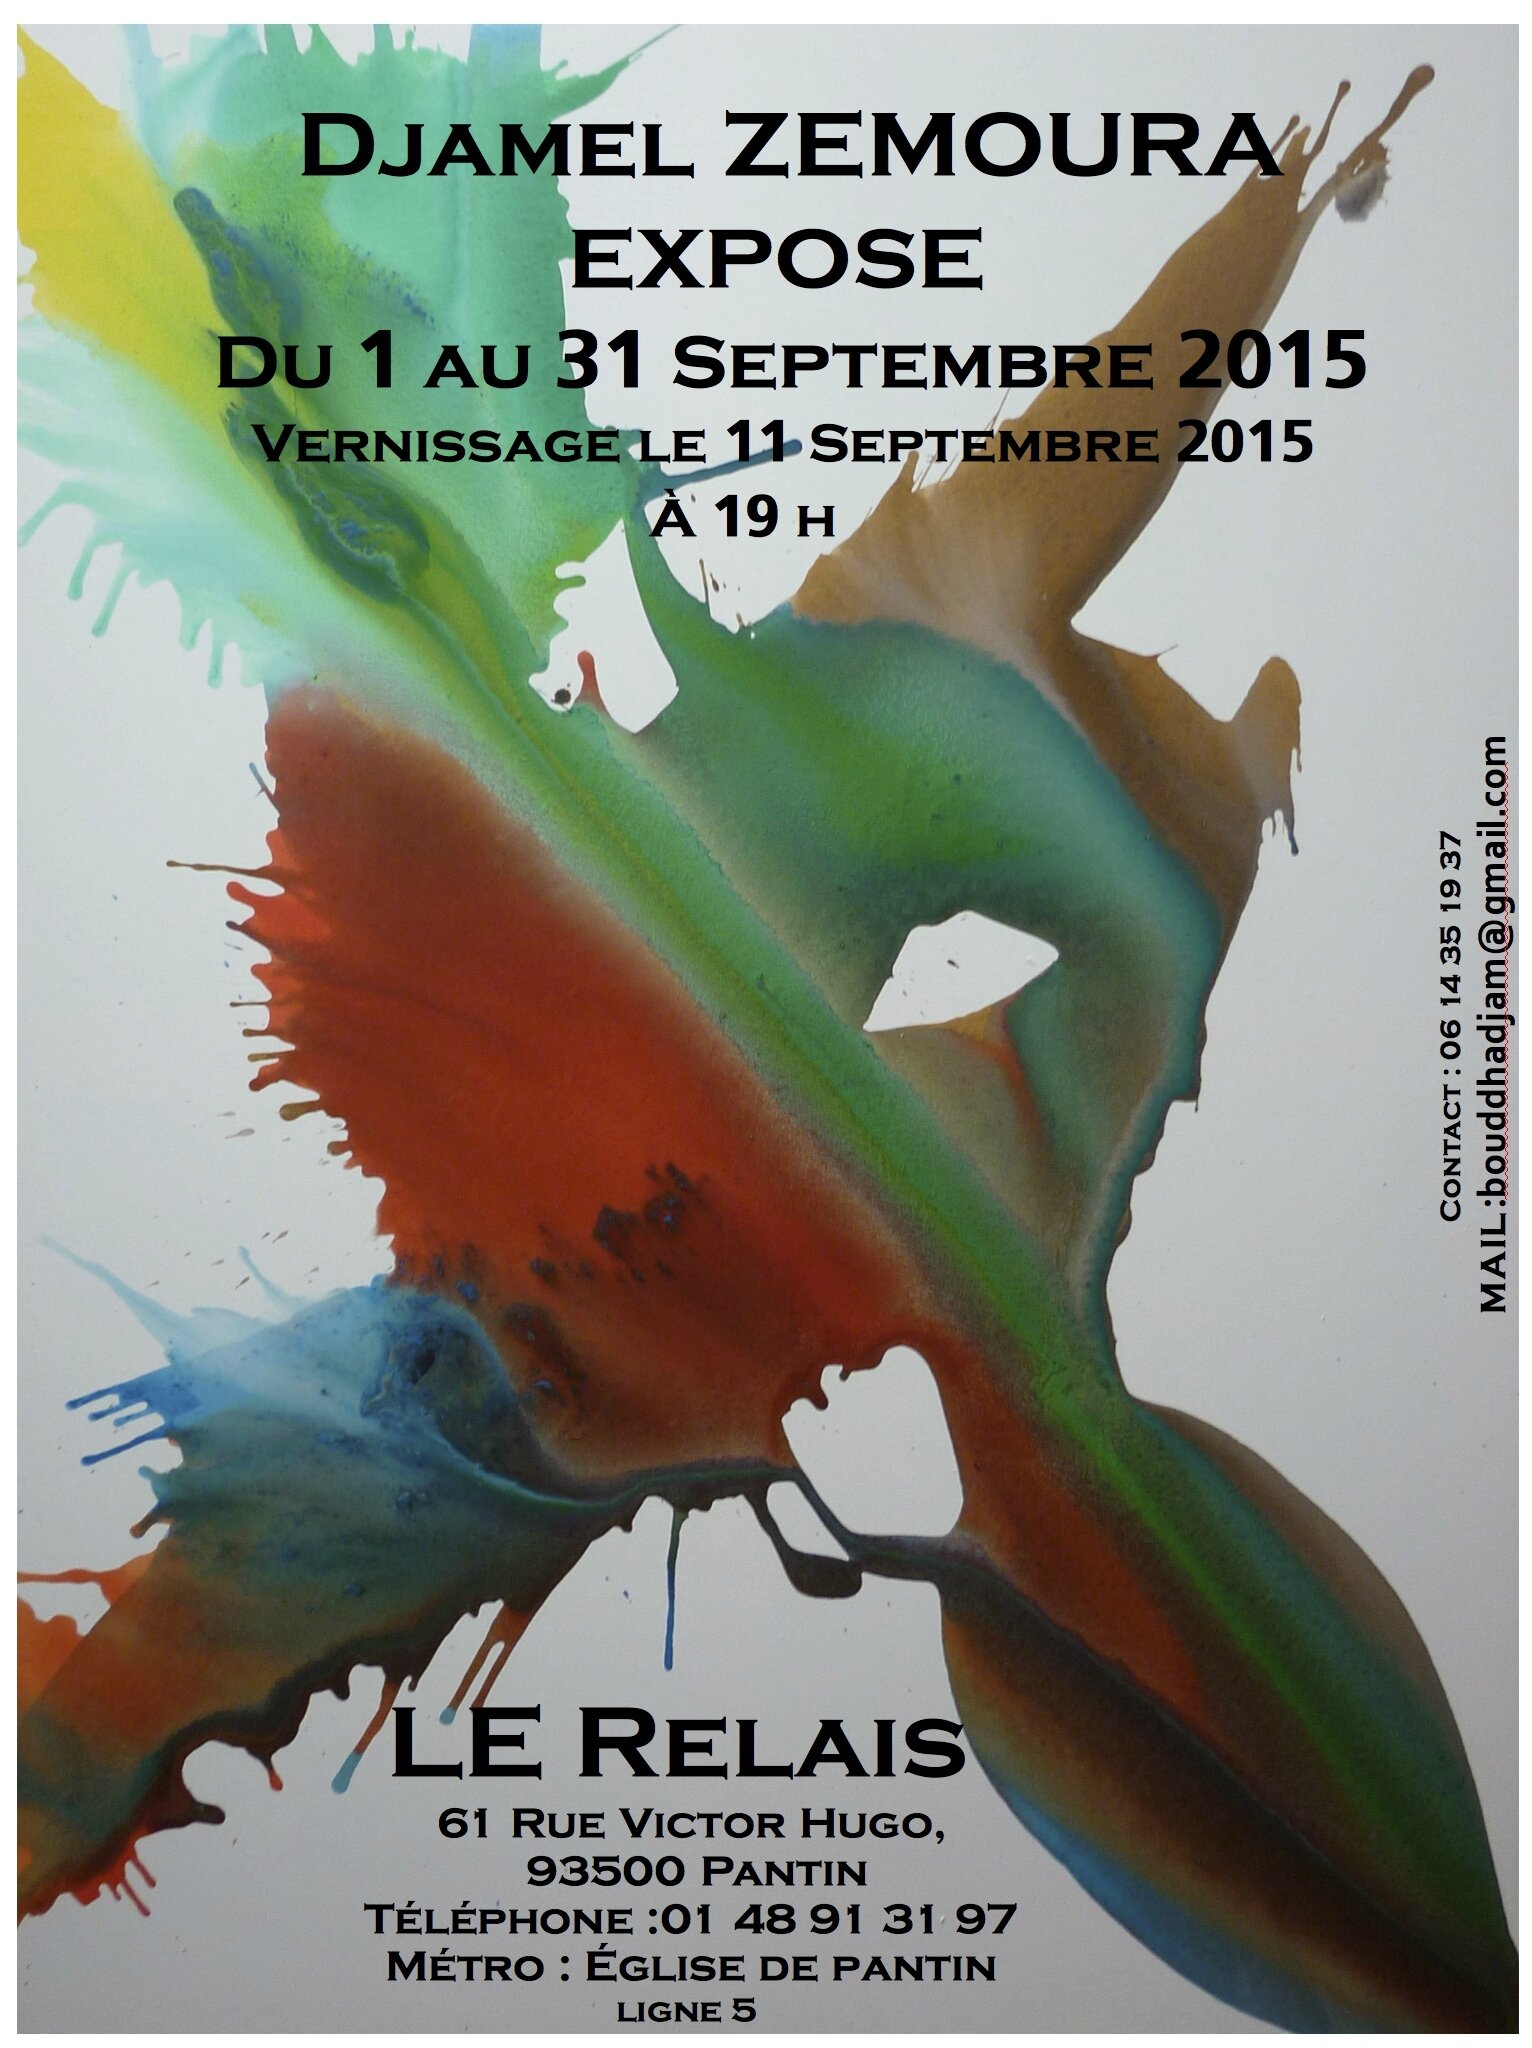 EXPO 2015 DJA